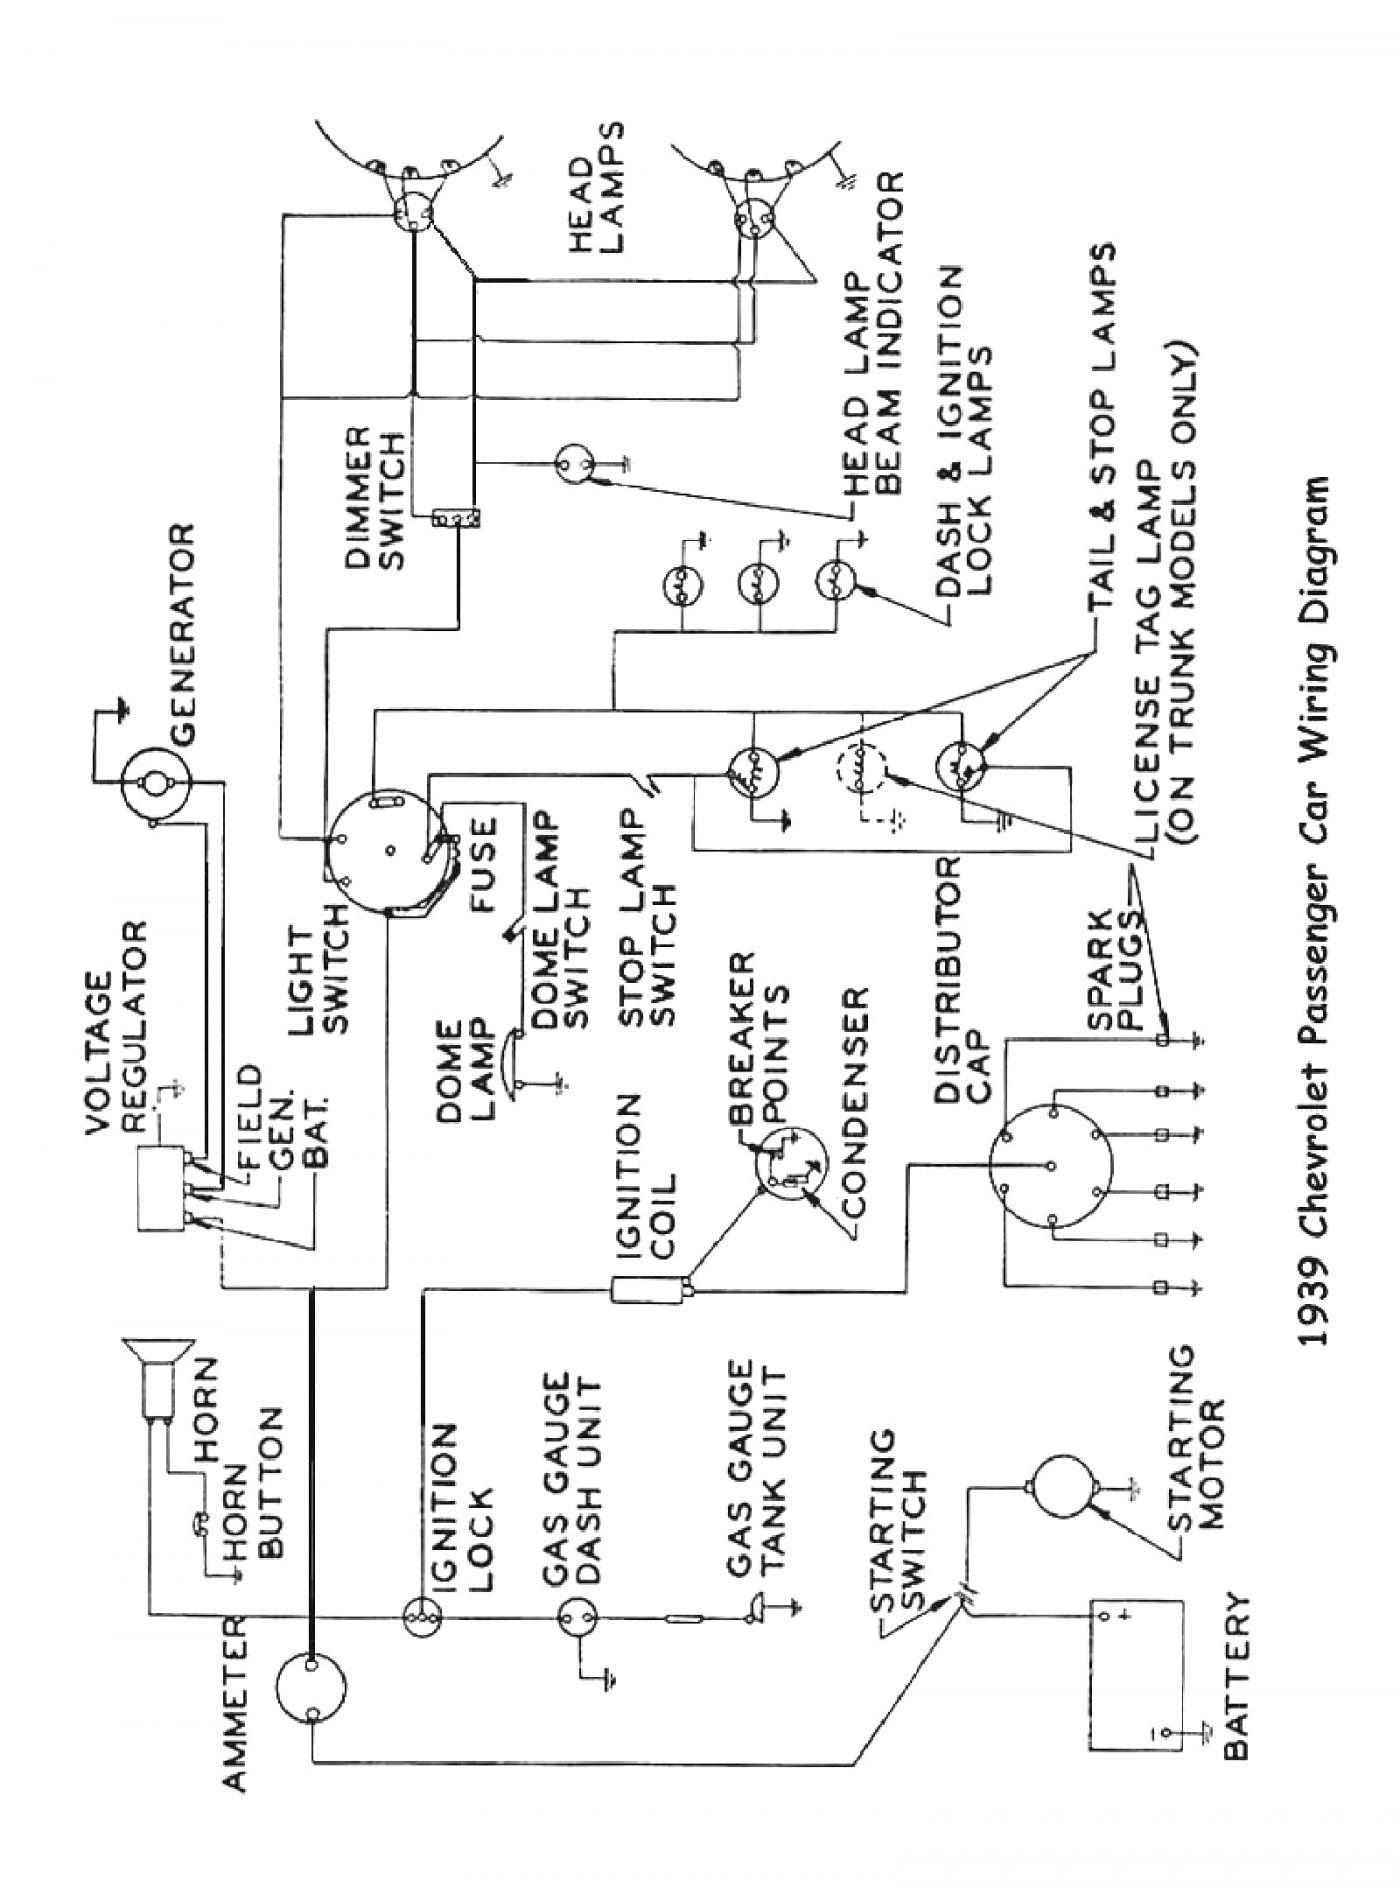 western unimount pro plow wiring diagram